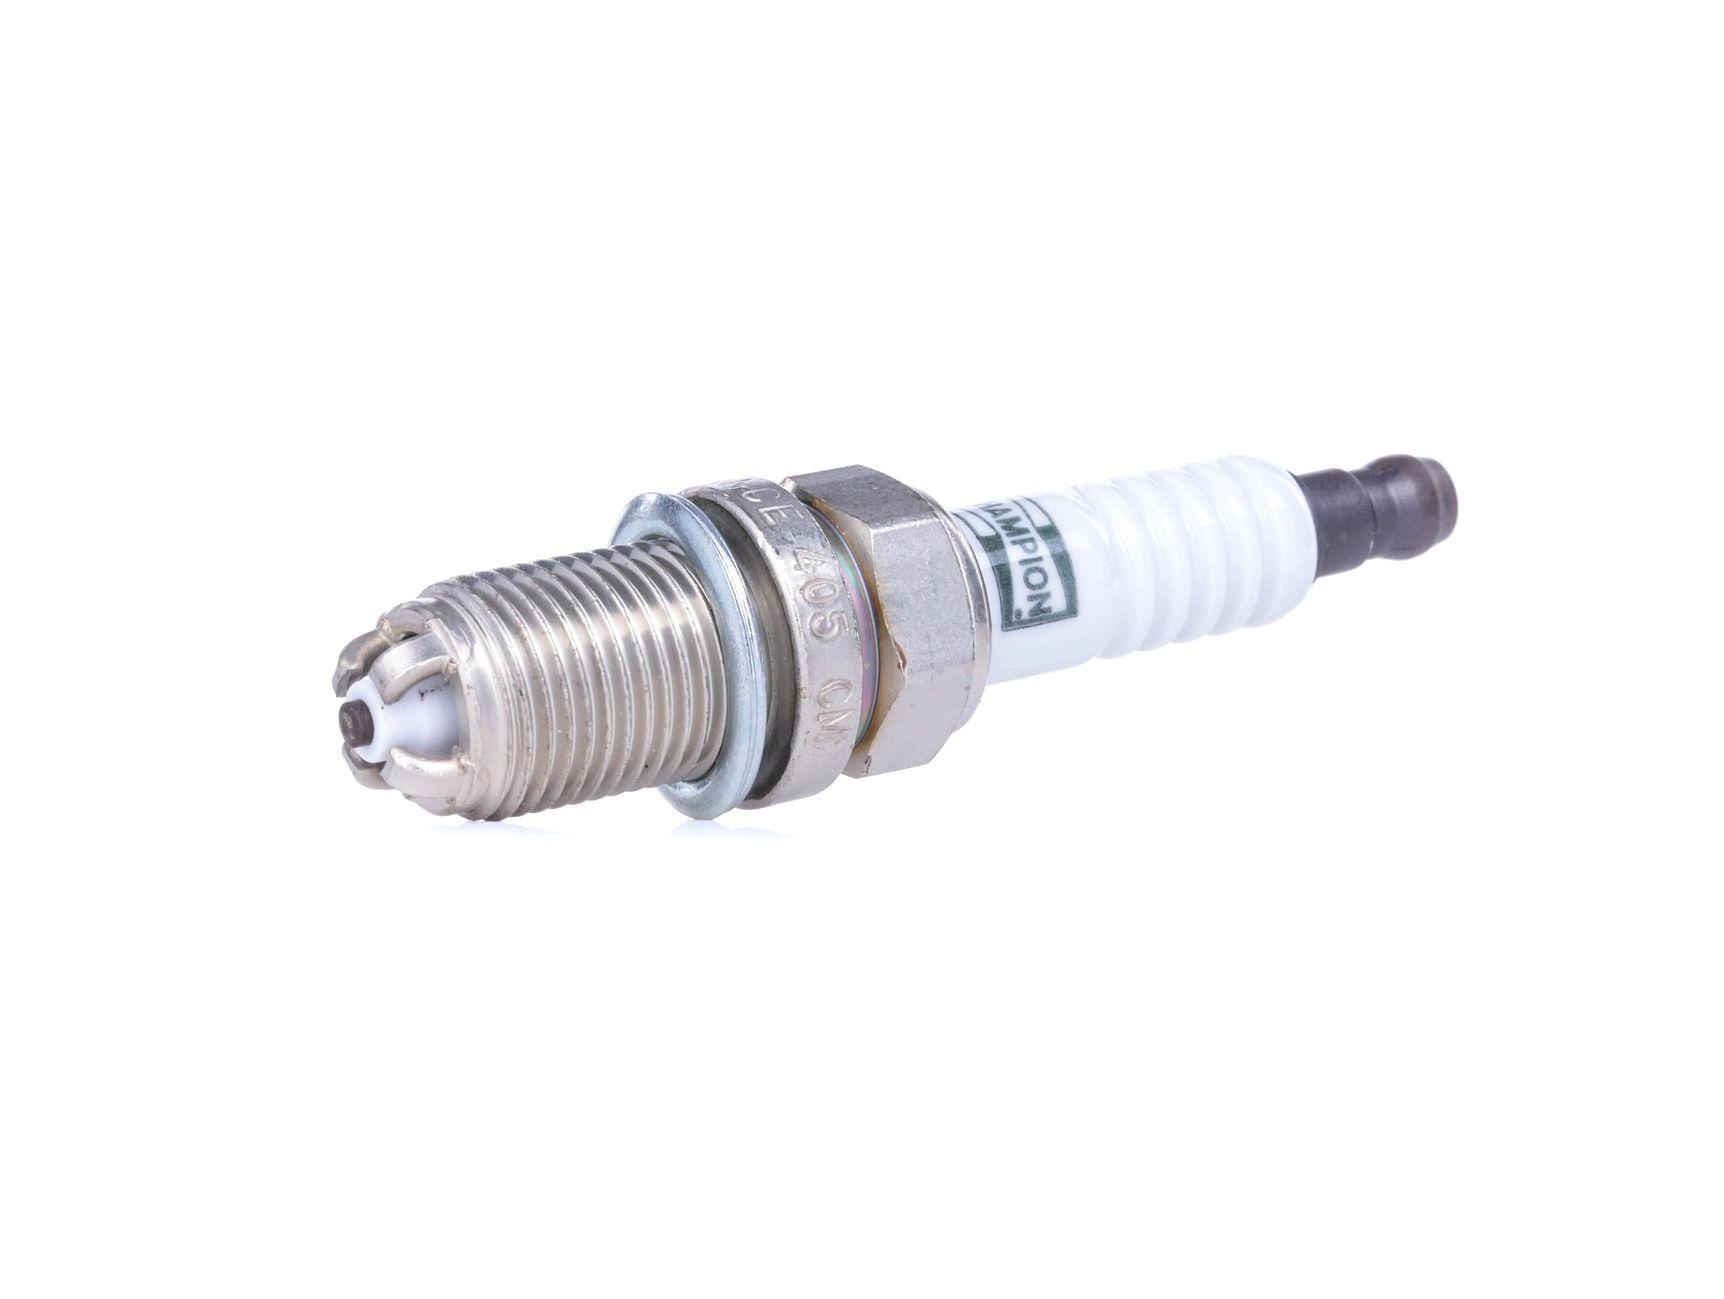 Spark Plug CHAMPION OE218 rating